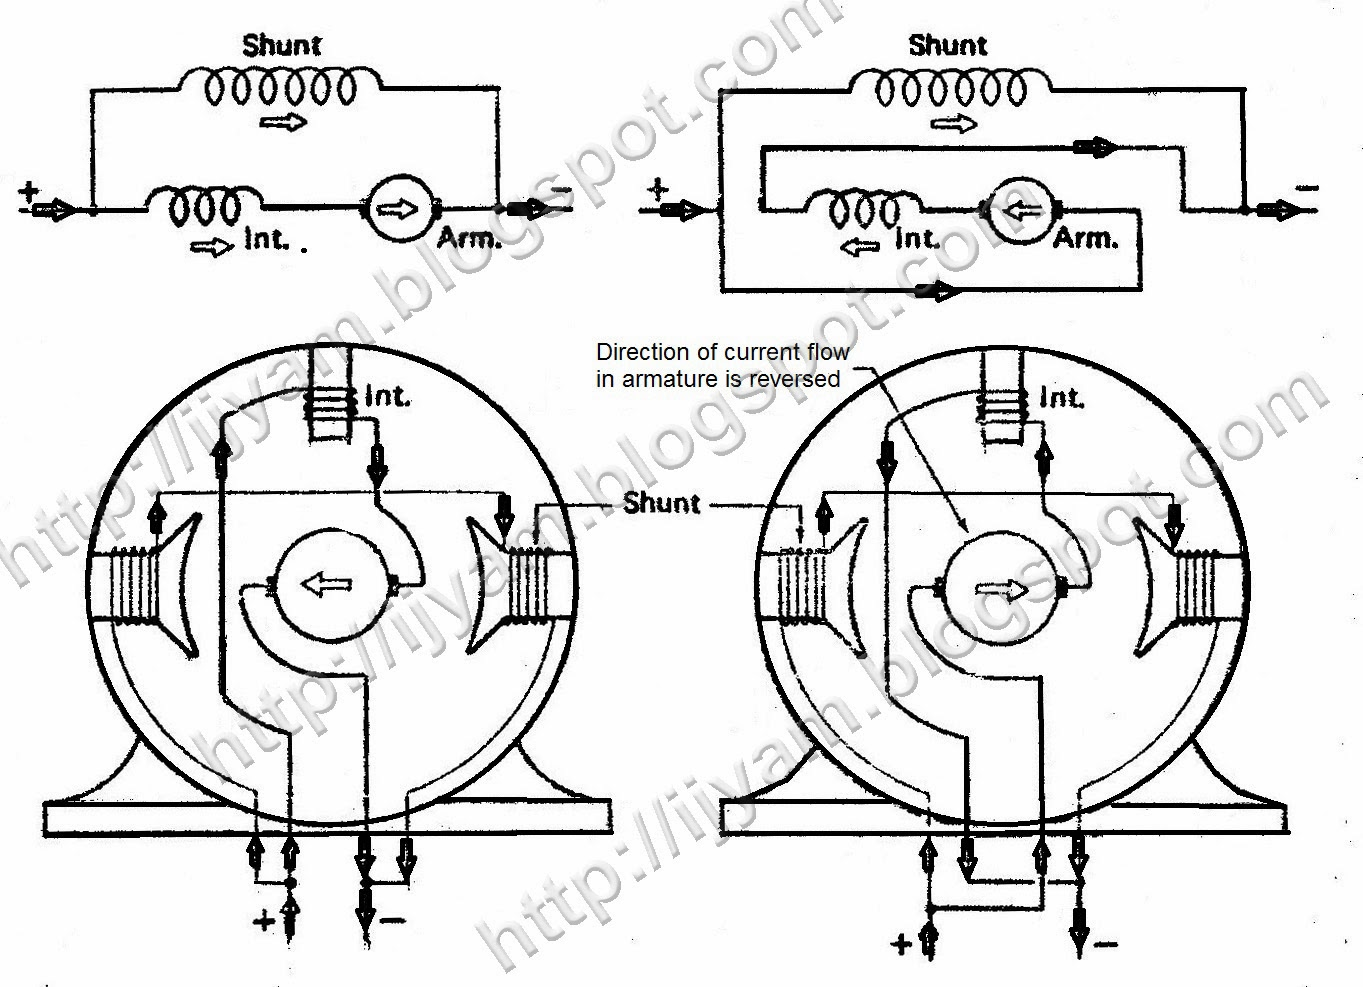 shunt motor wiring diagram printable teeth compound compress